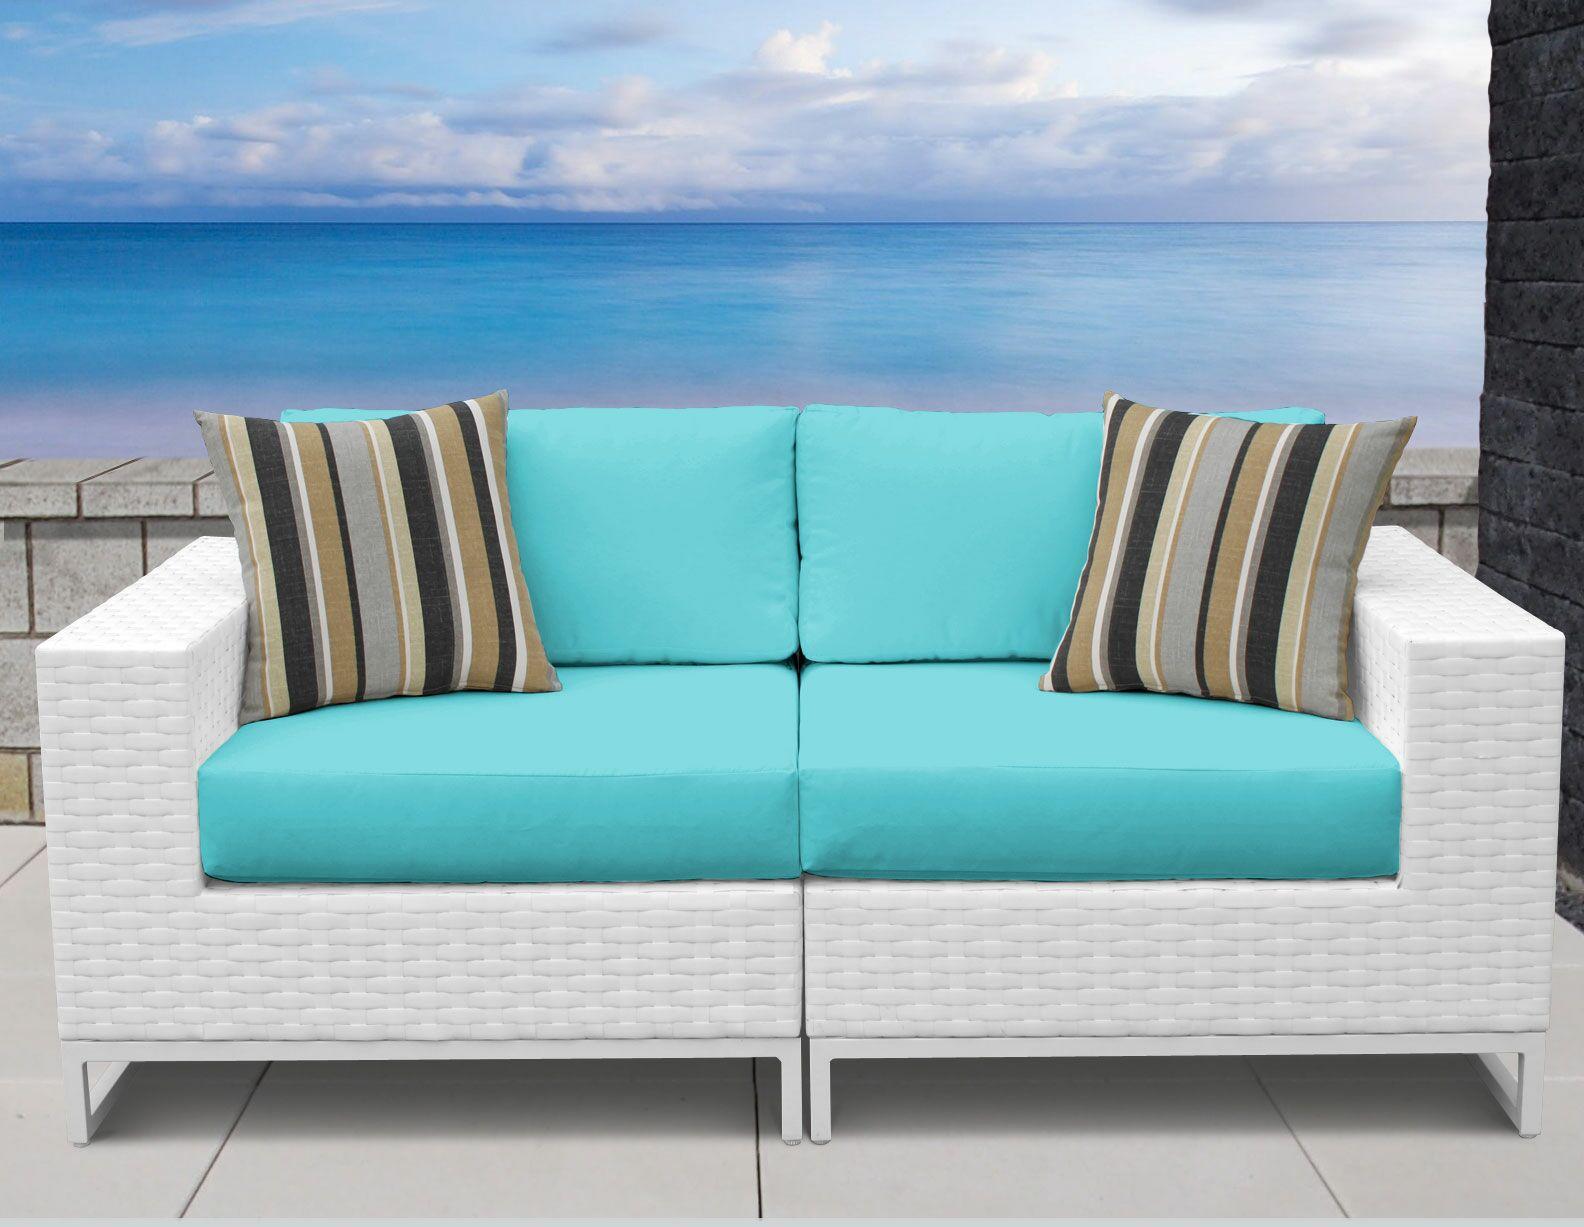 Miami 2 Piece Sofa Set with Cushions Fabric: Aruba